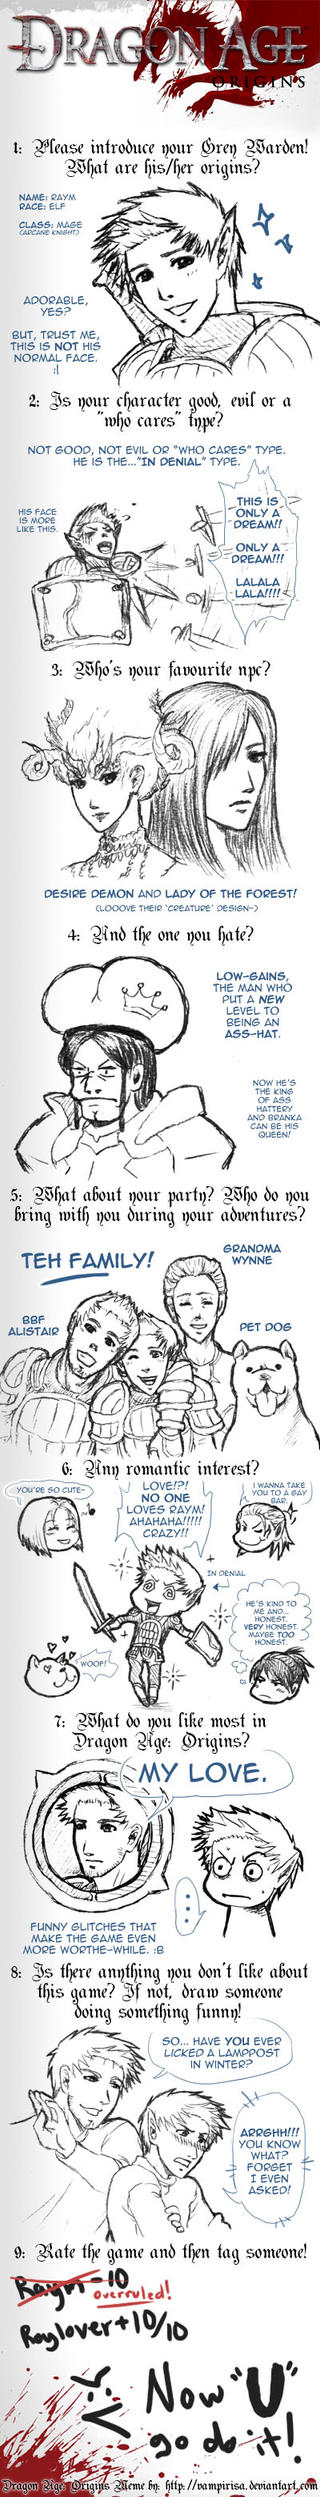 Dragon Age Meme by RoyLover